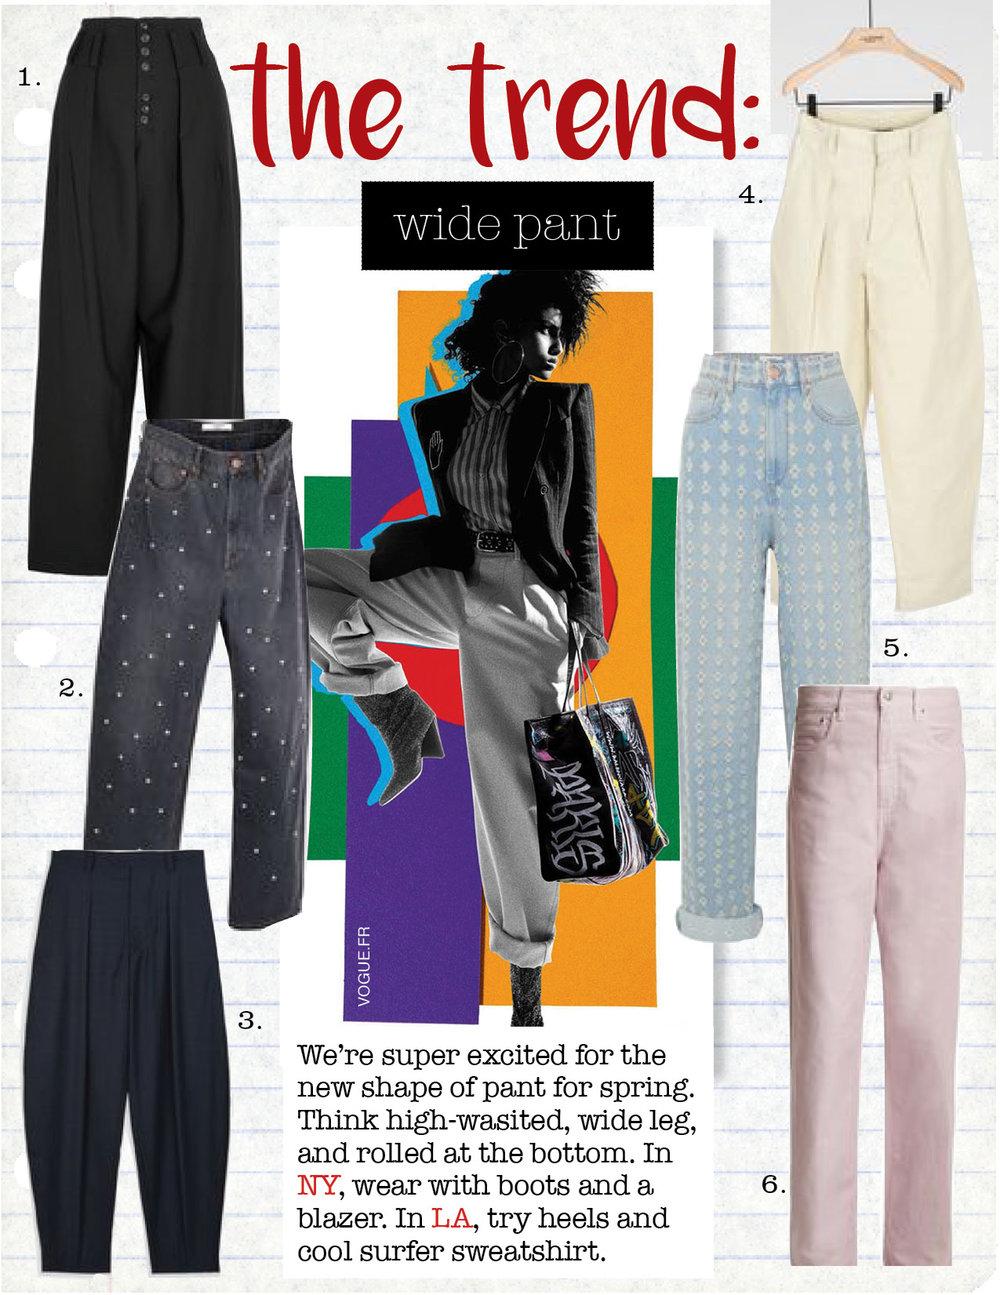 1. joseph howard stretch-gabardine wide-leg pants, $298,  net-a-porter.com  2. isabel marant etoile curt studded oversize boyfriend fit jeans, $194,  isabelmarant.com  3. isabel marant mexi oversize new wool trousers, $334,  isabelmarant.com  4. isabel marant hexi wide leg pants, $550,  isabelmarant.com  5. isabel marant etoile cory distressed boyfriend jeans, $395,  net-a-porter.com  6. isabel marant etoile forby straight-leg jeans, $290,  matchesfashion.com